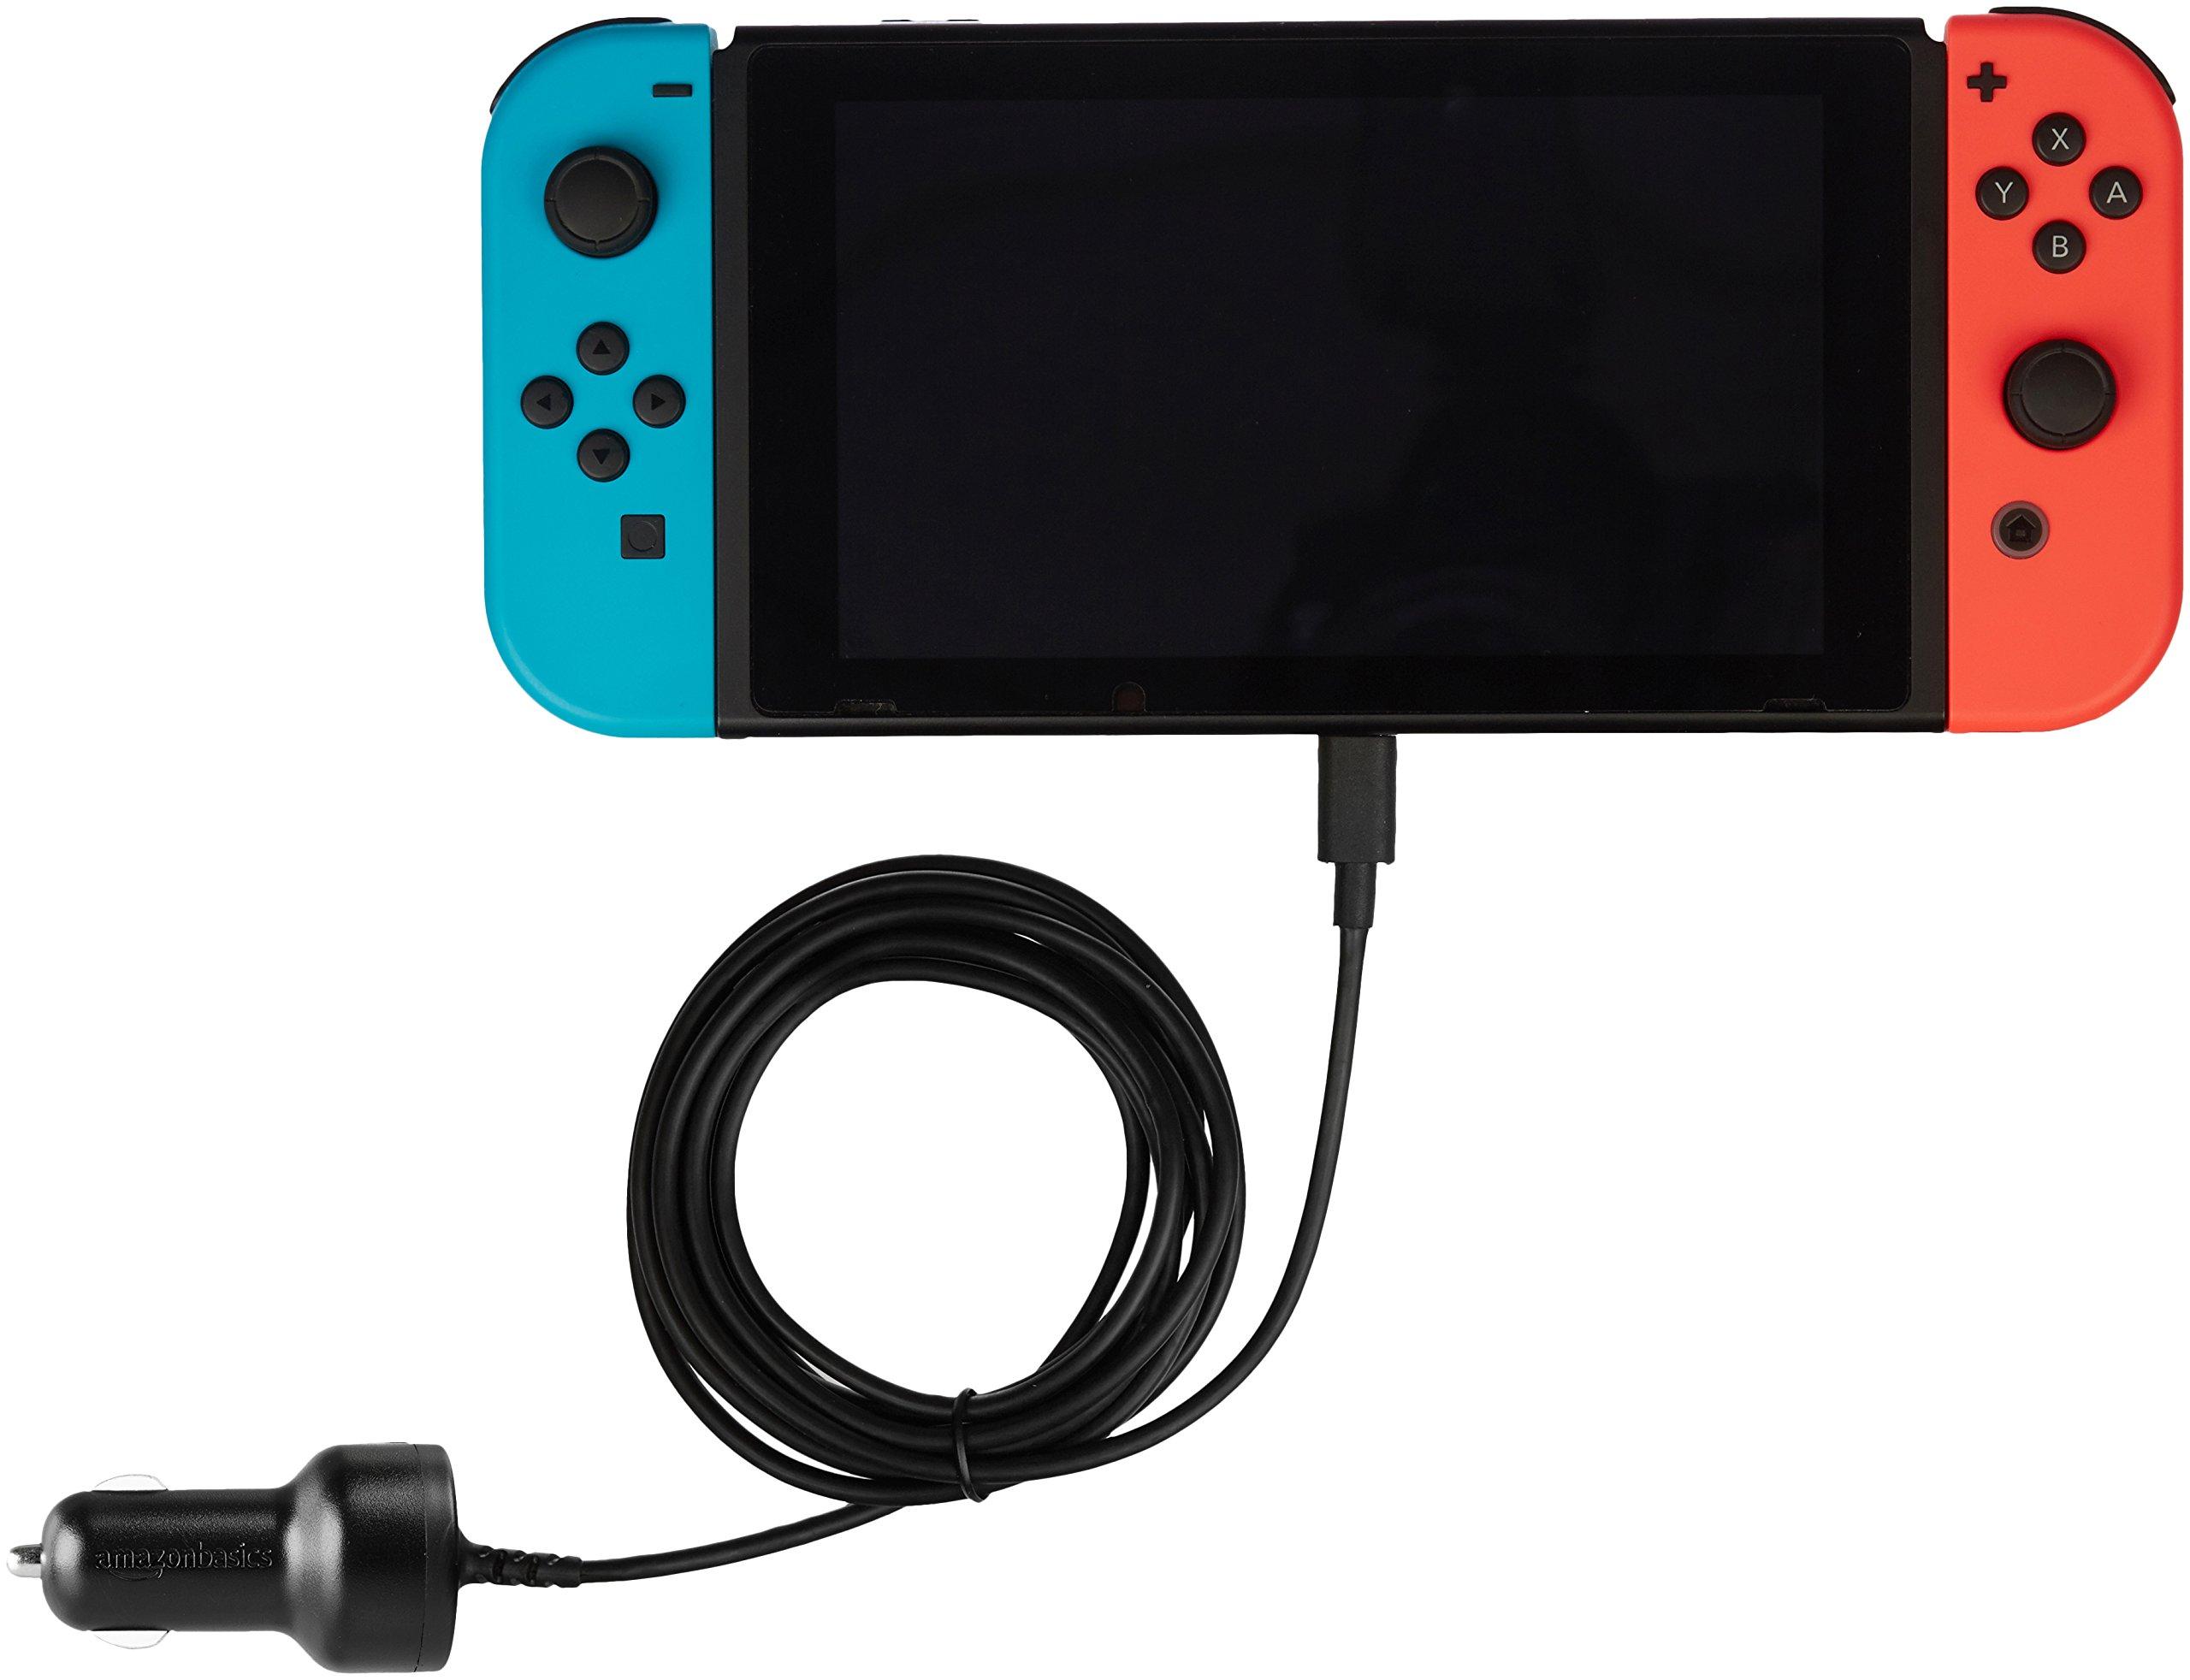 AmazonBasics Car Charger for Nintendo Switch